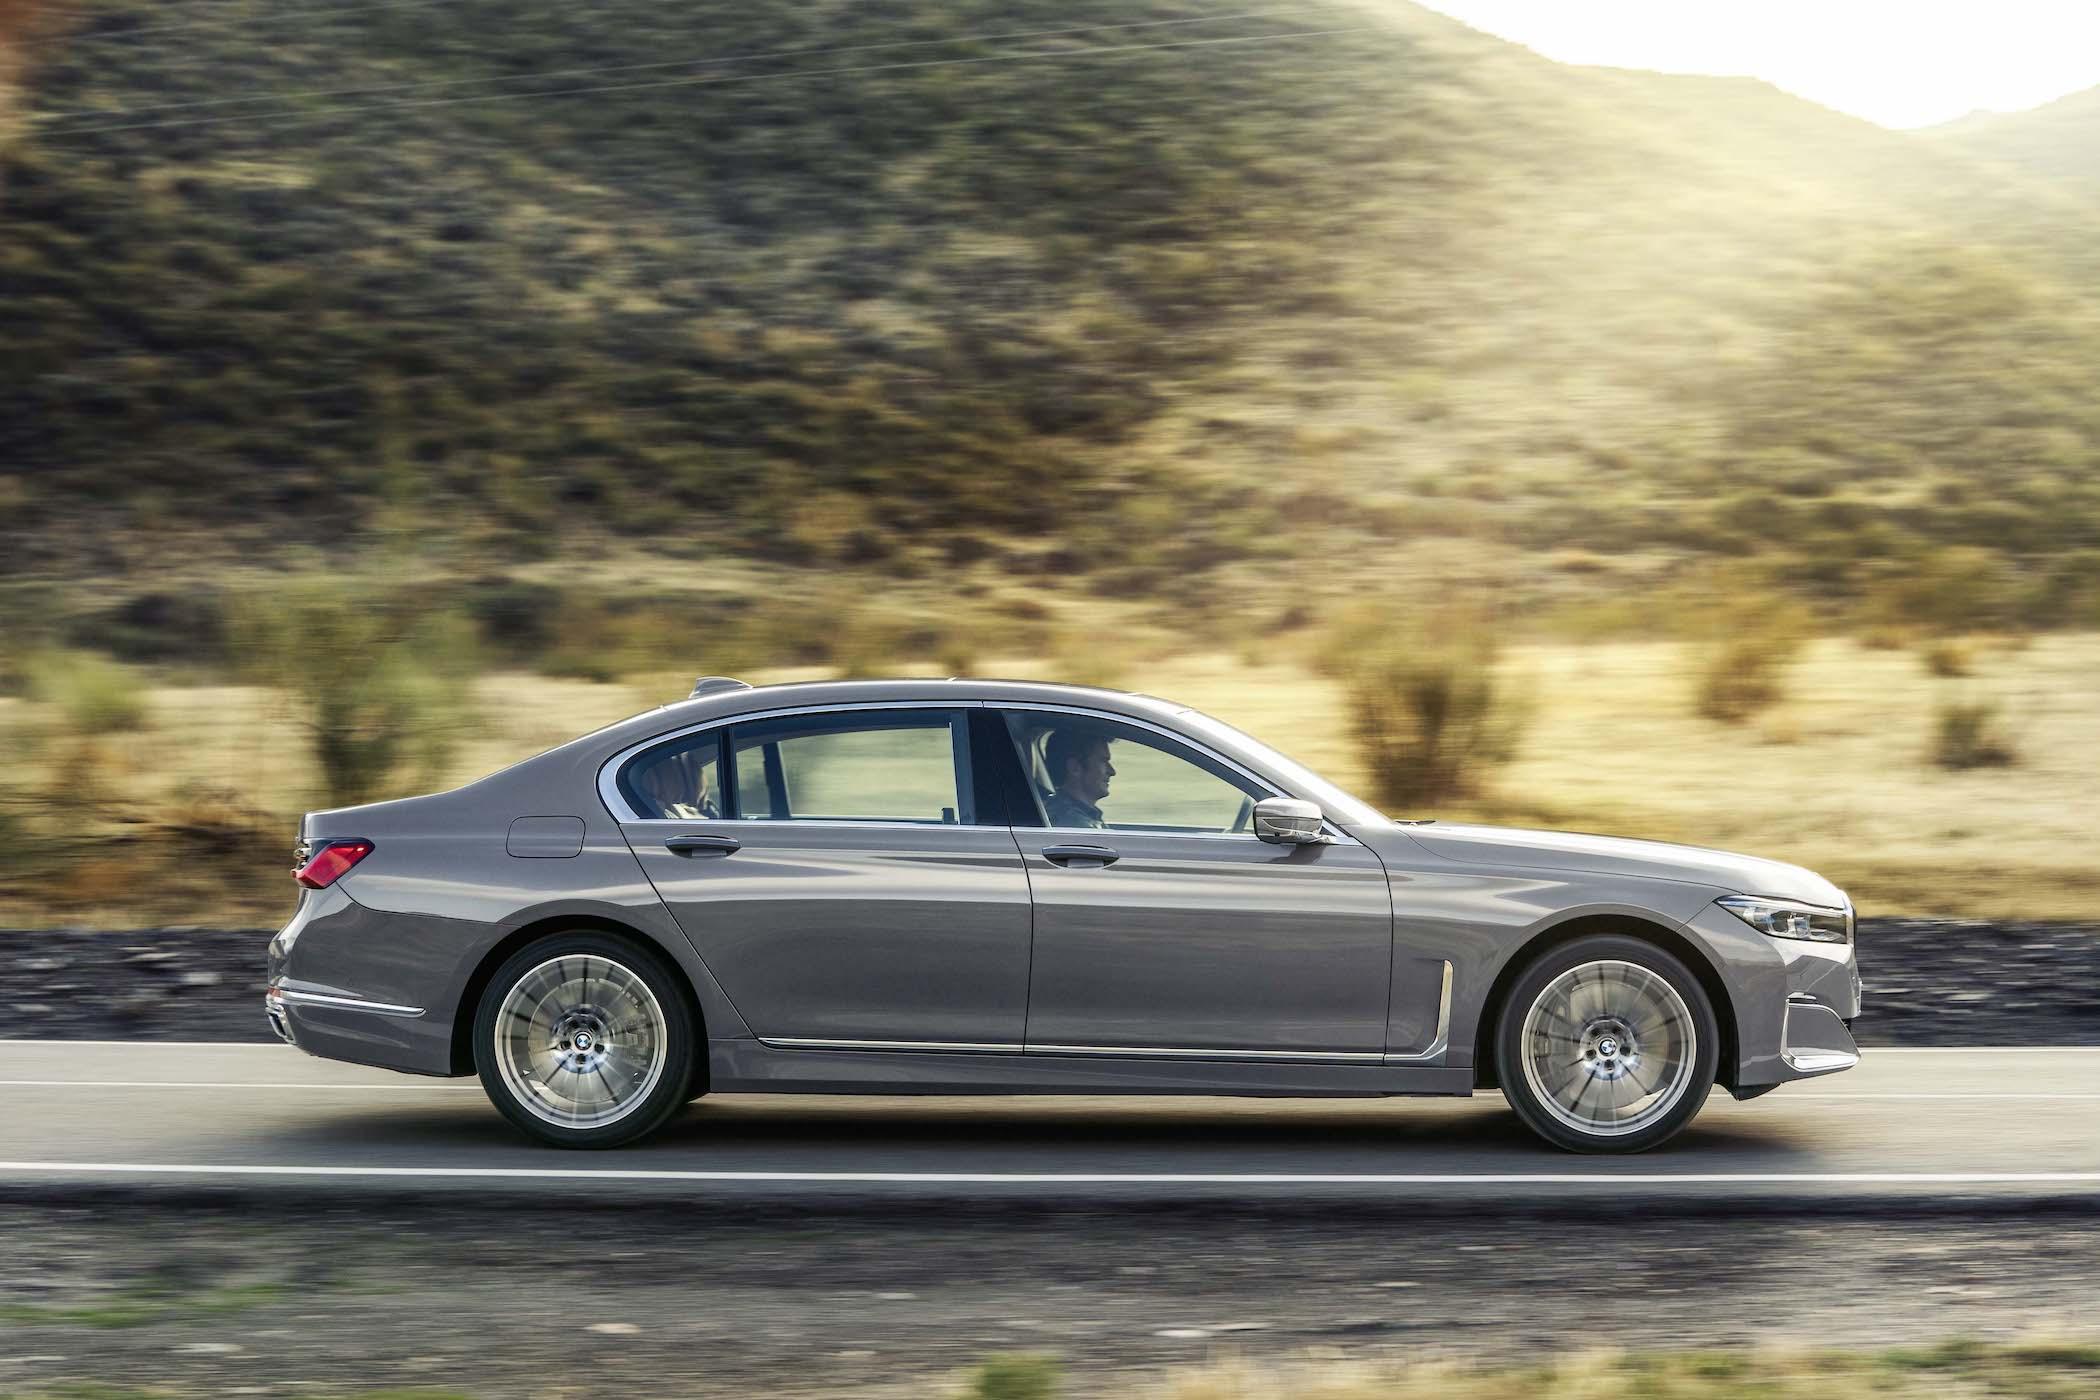 The New 2020 Bmw 7 Series Sedan Automotive Rhythms